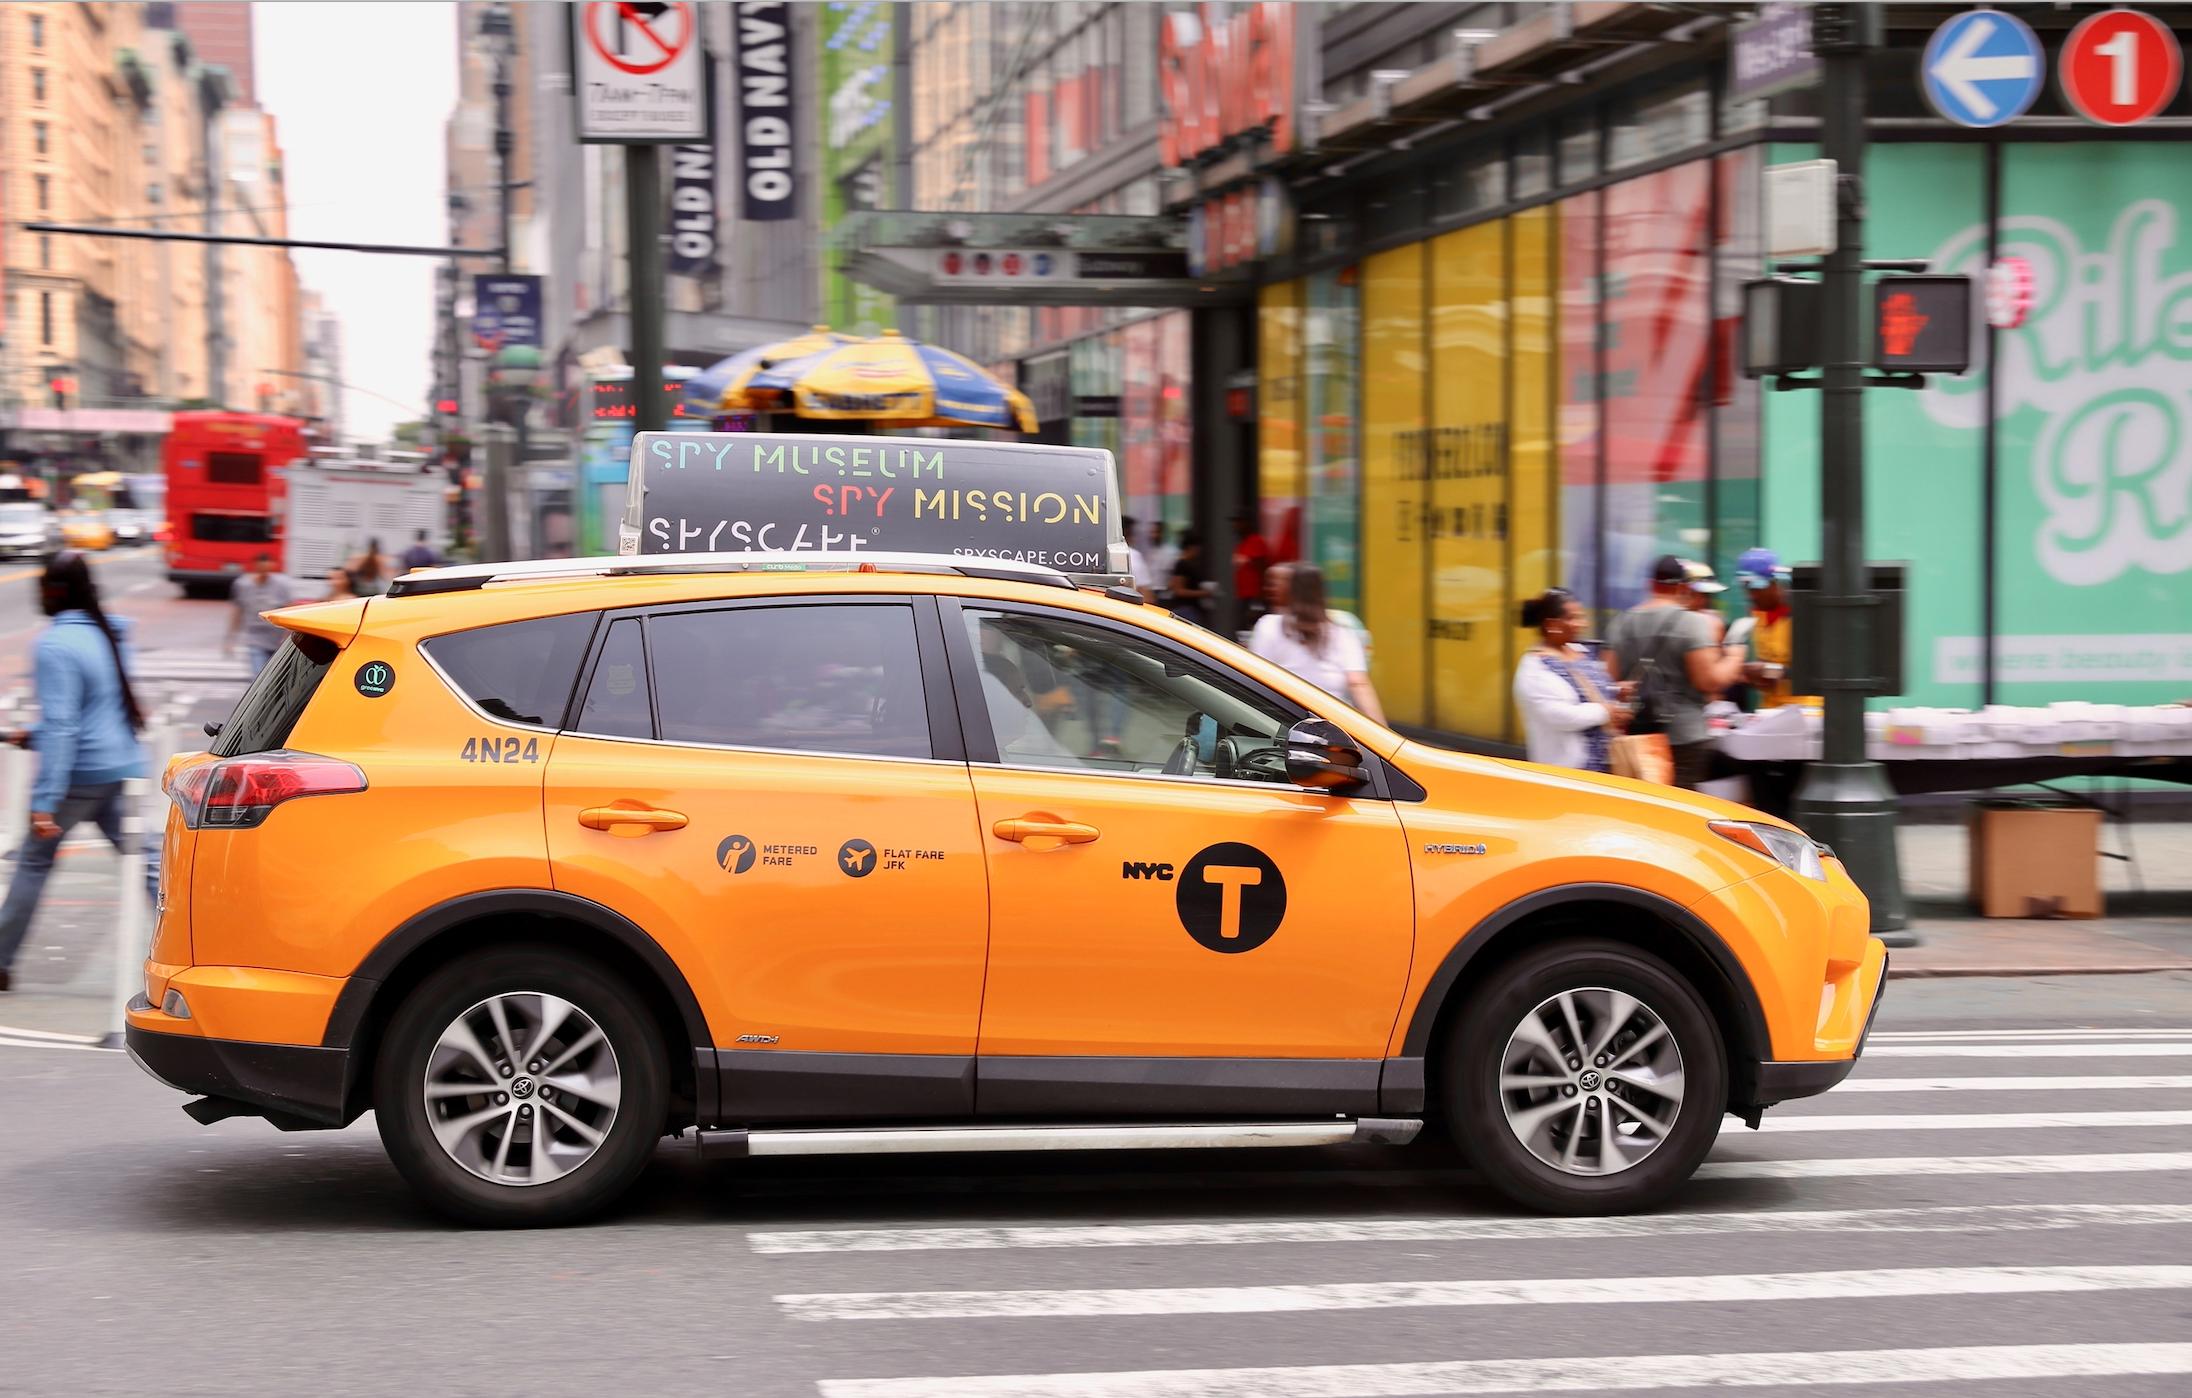 NY: Standard 2-Sided Tops